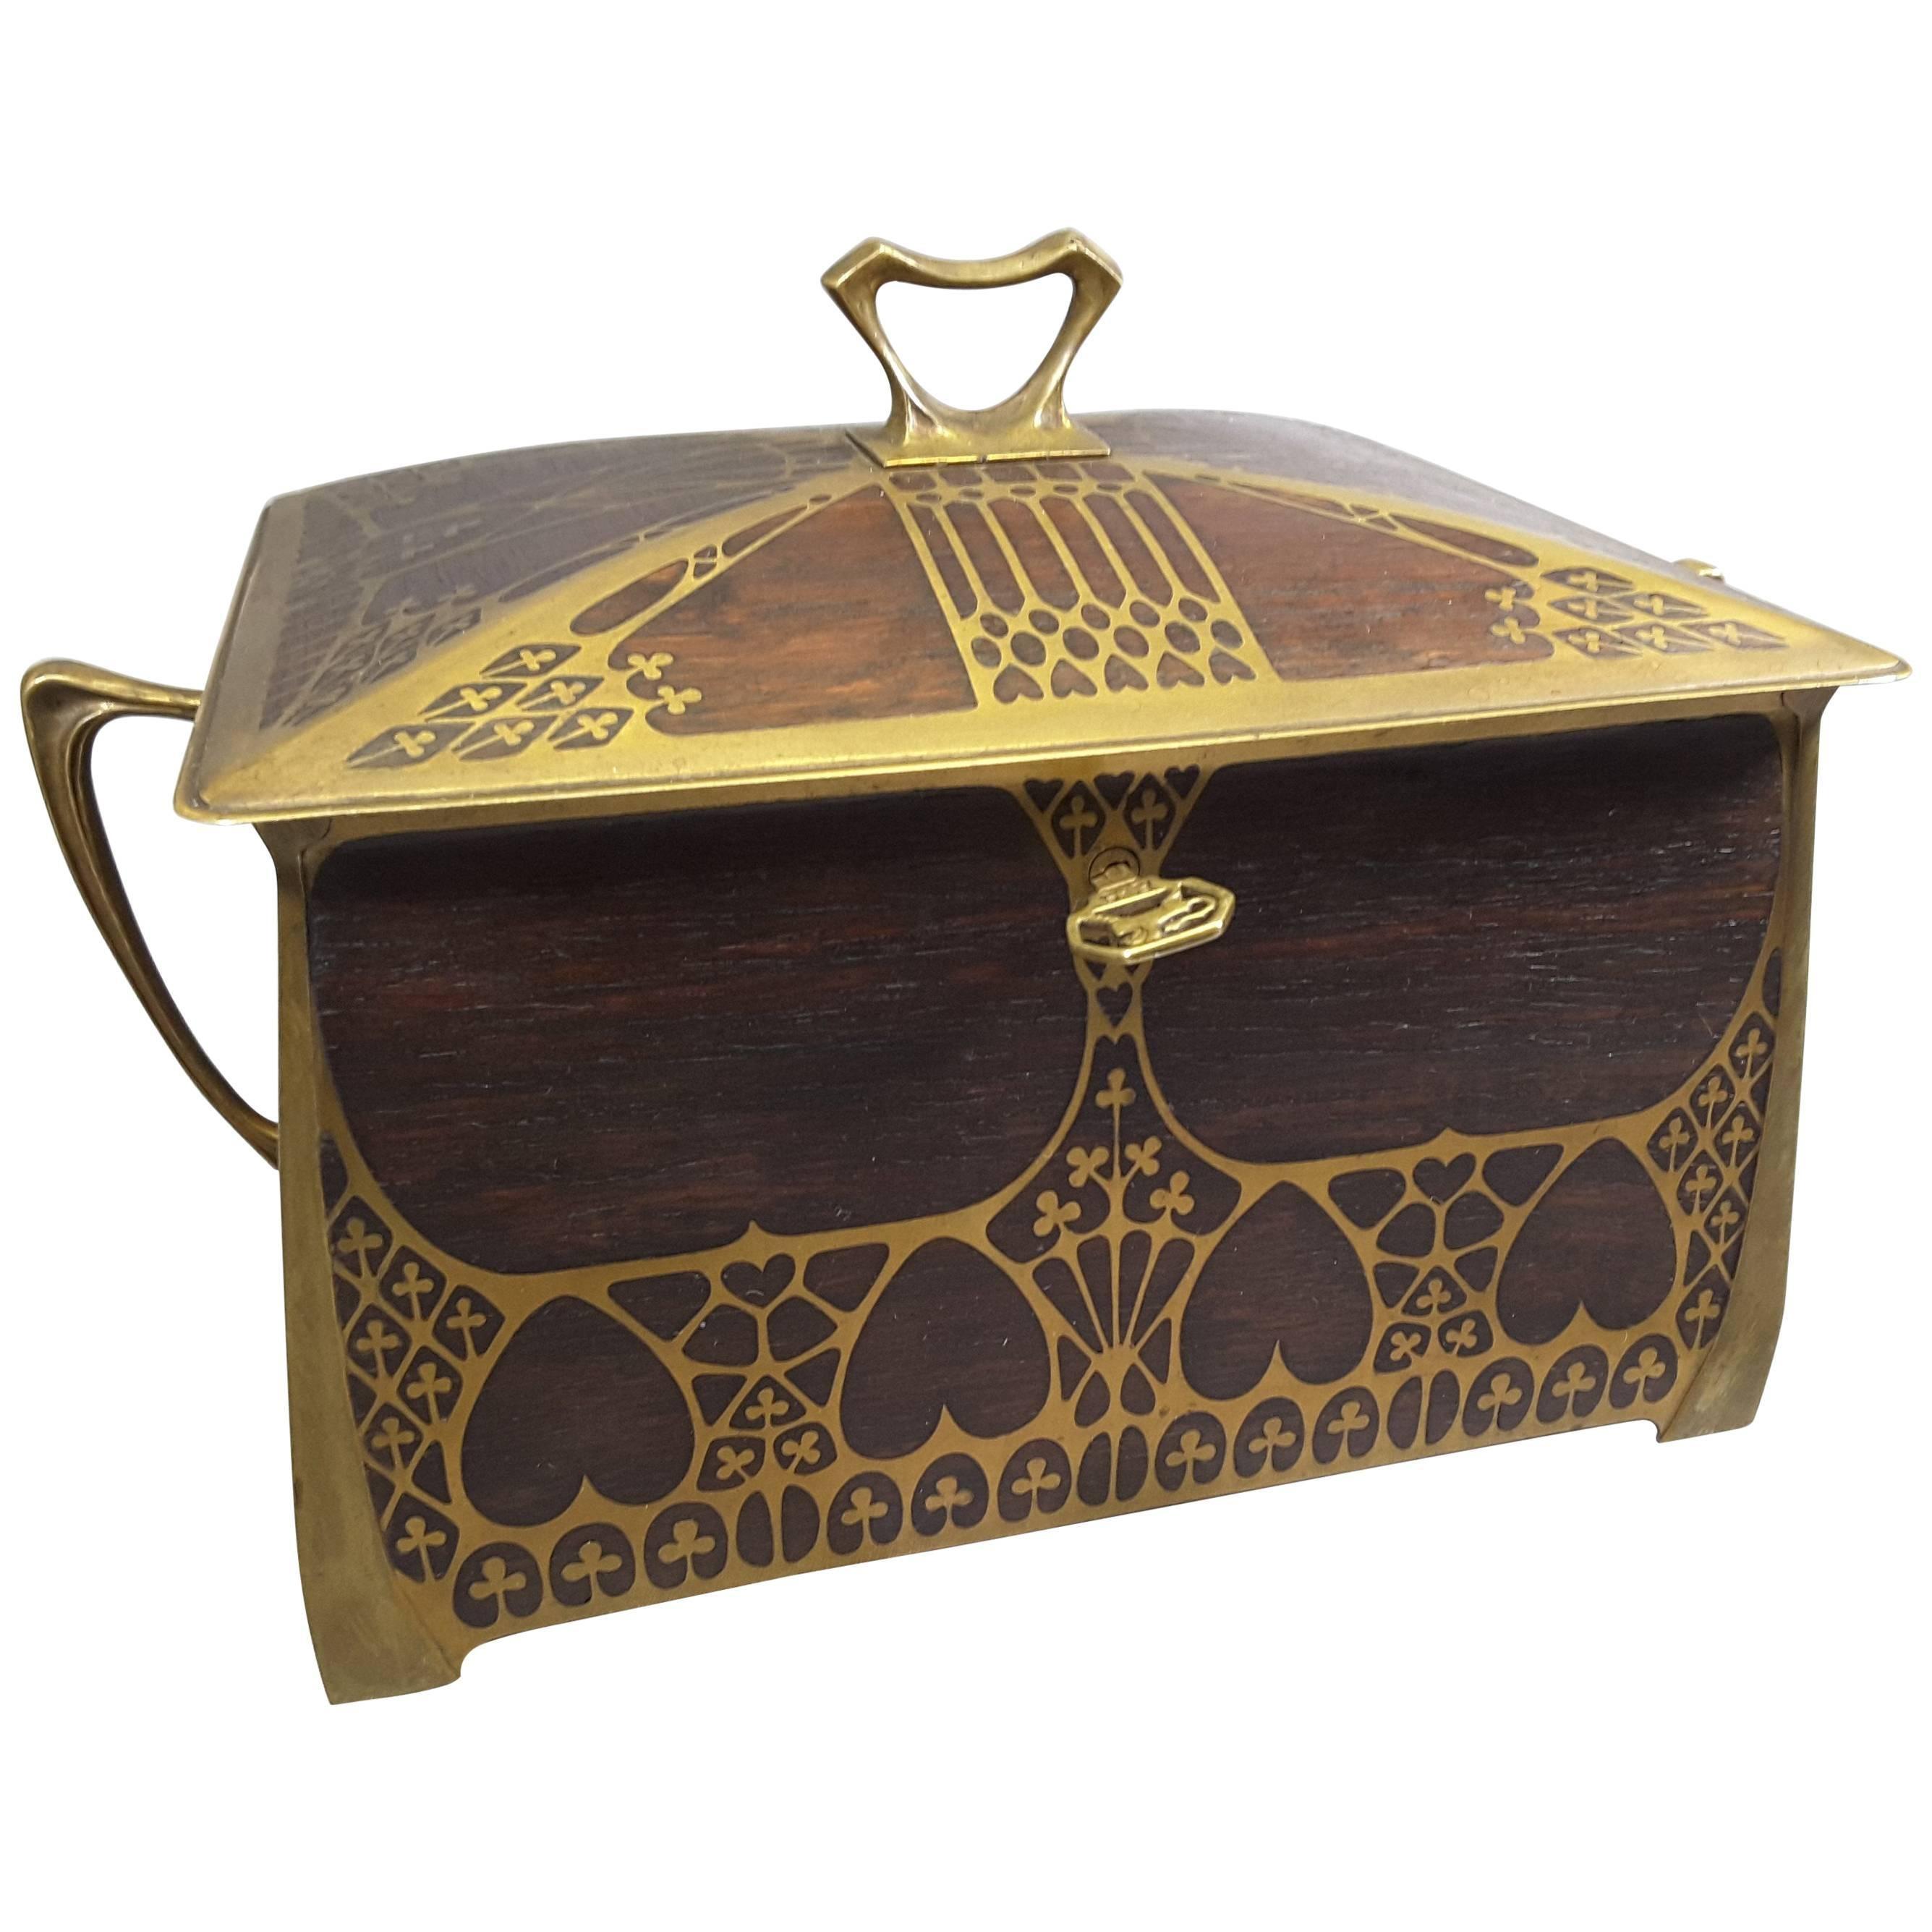 Art Nouveau Boxes 81 For Sale at 1stdibs